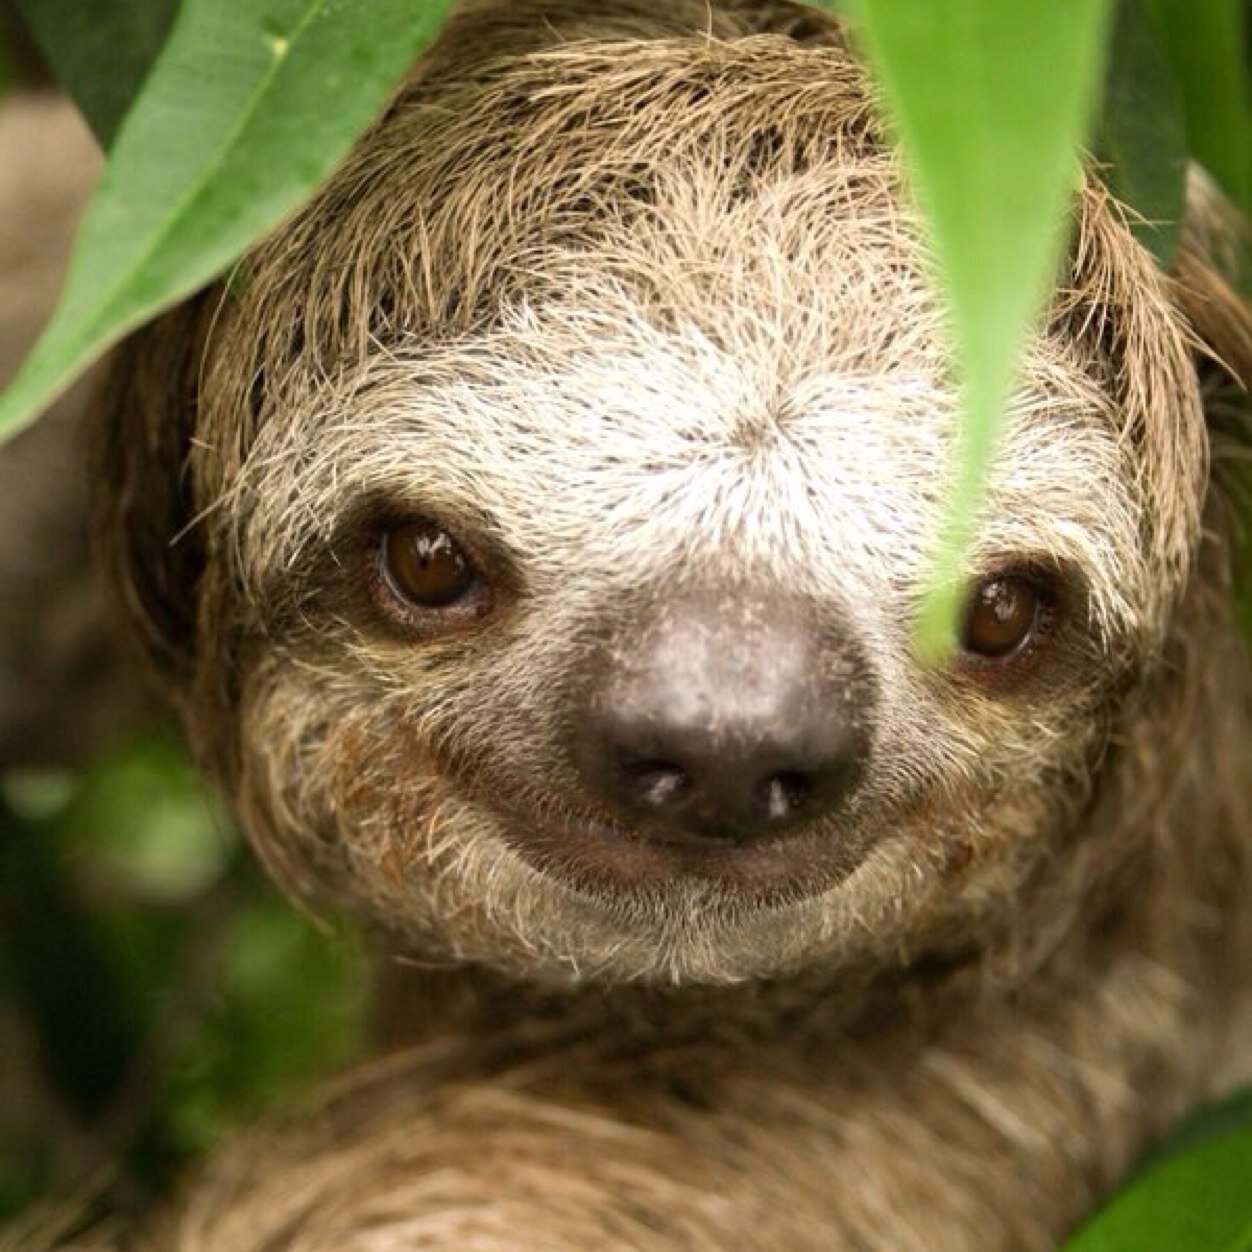 Rape sloth original - photo#35